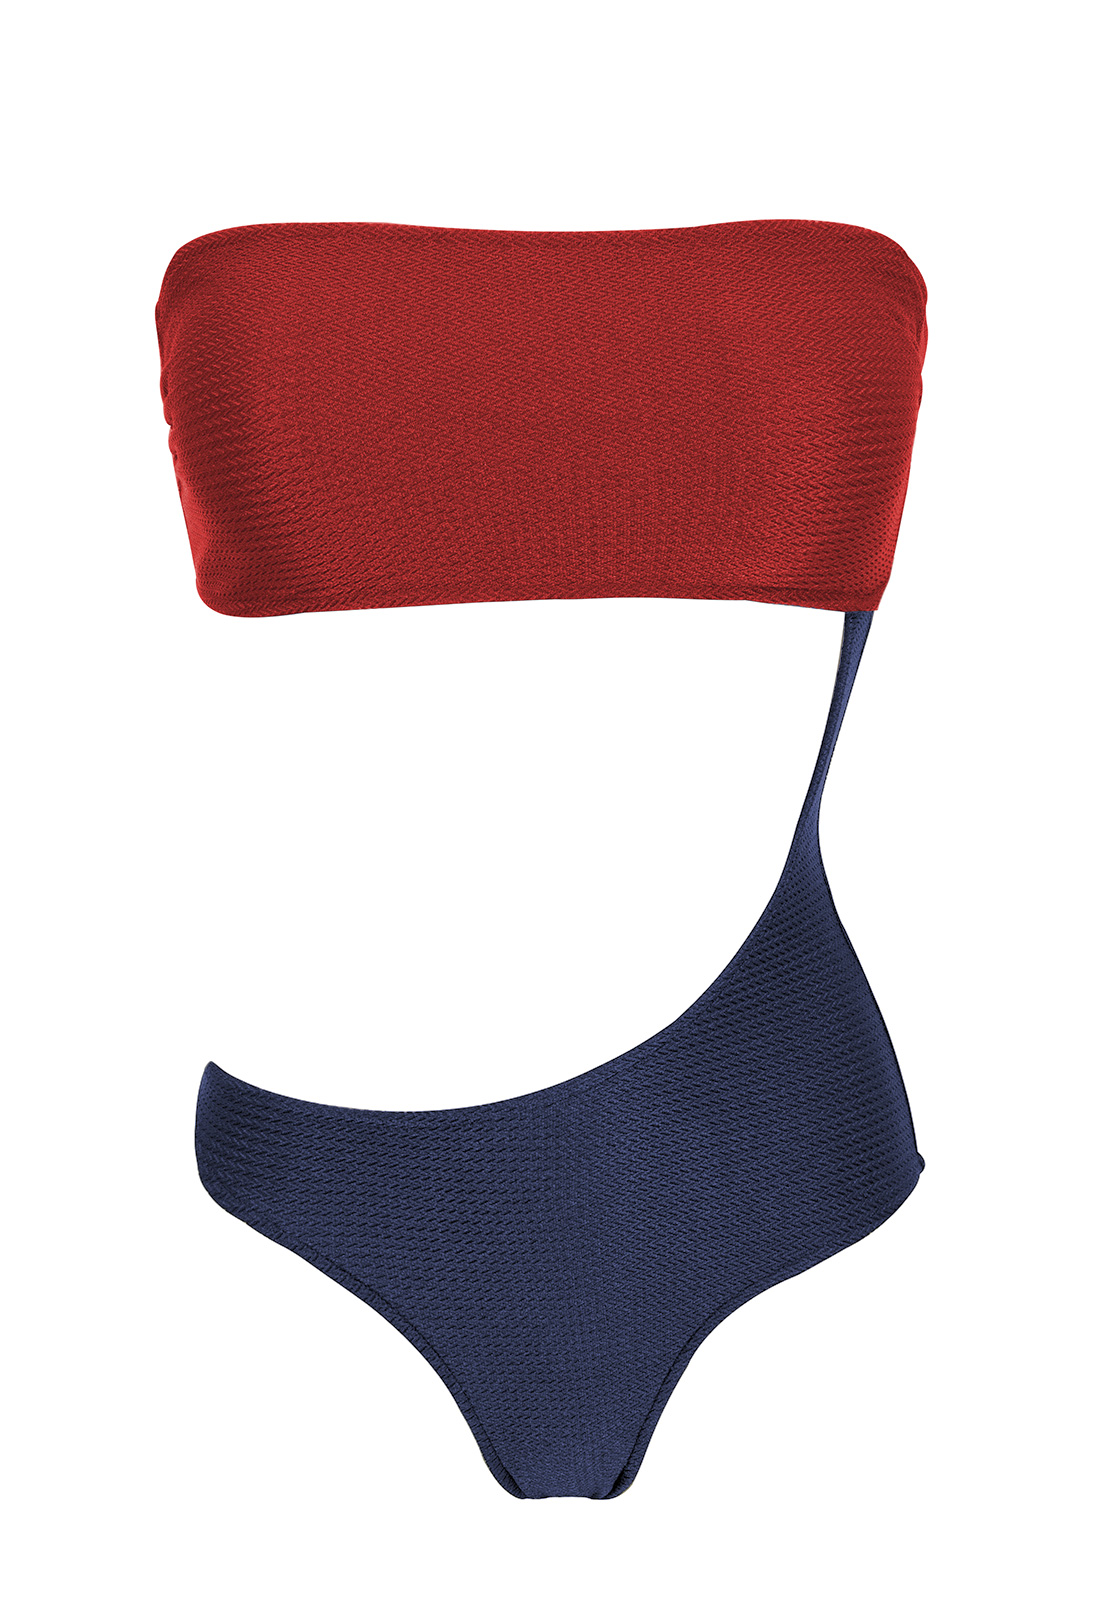 Bandeau Badpak.Asymmetrisch Bandeau Badpak Rood Zwart Met Textuur Body Color Red